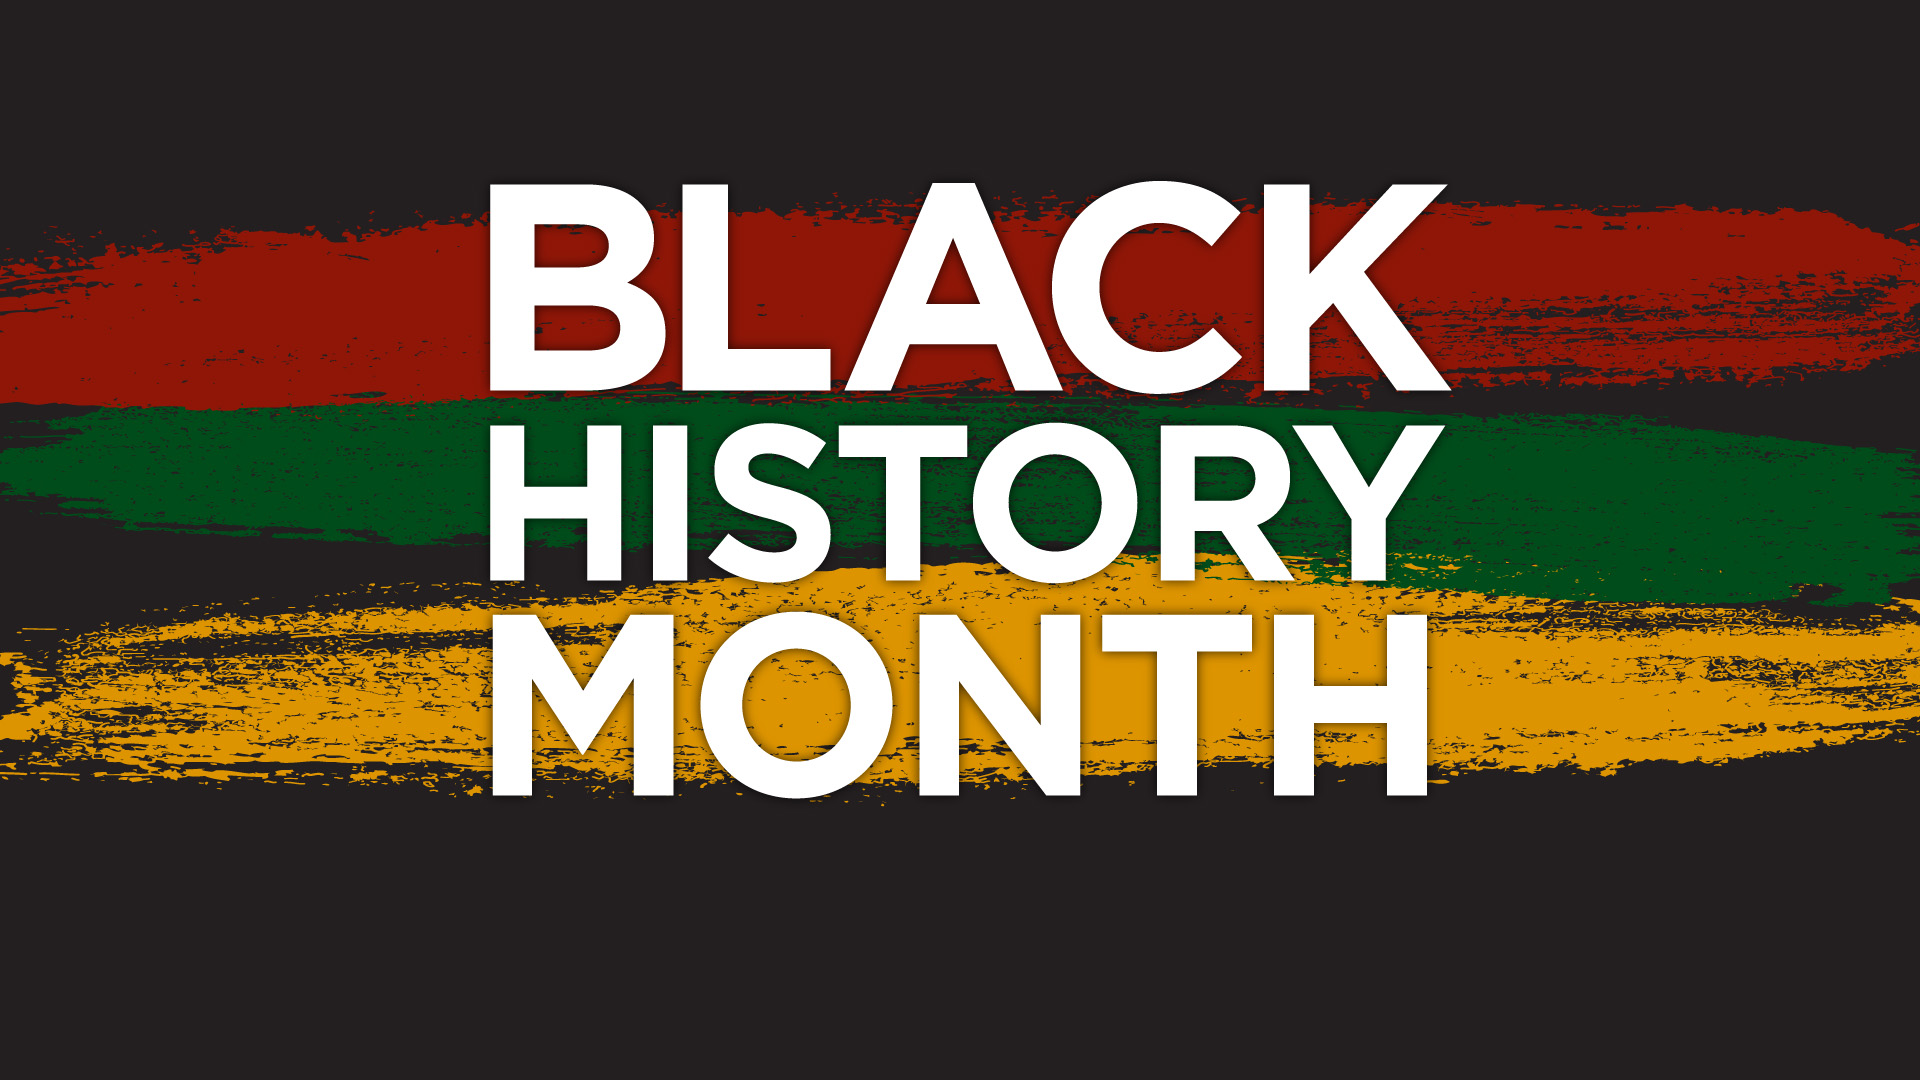 Black history month 2017 image